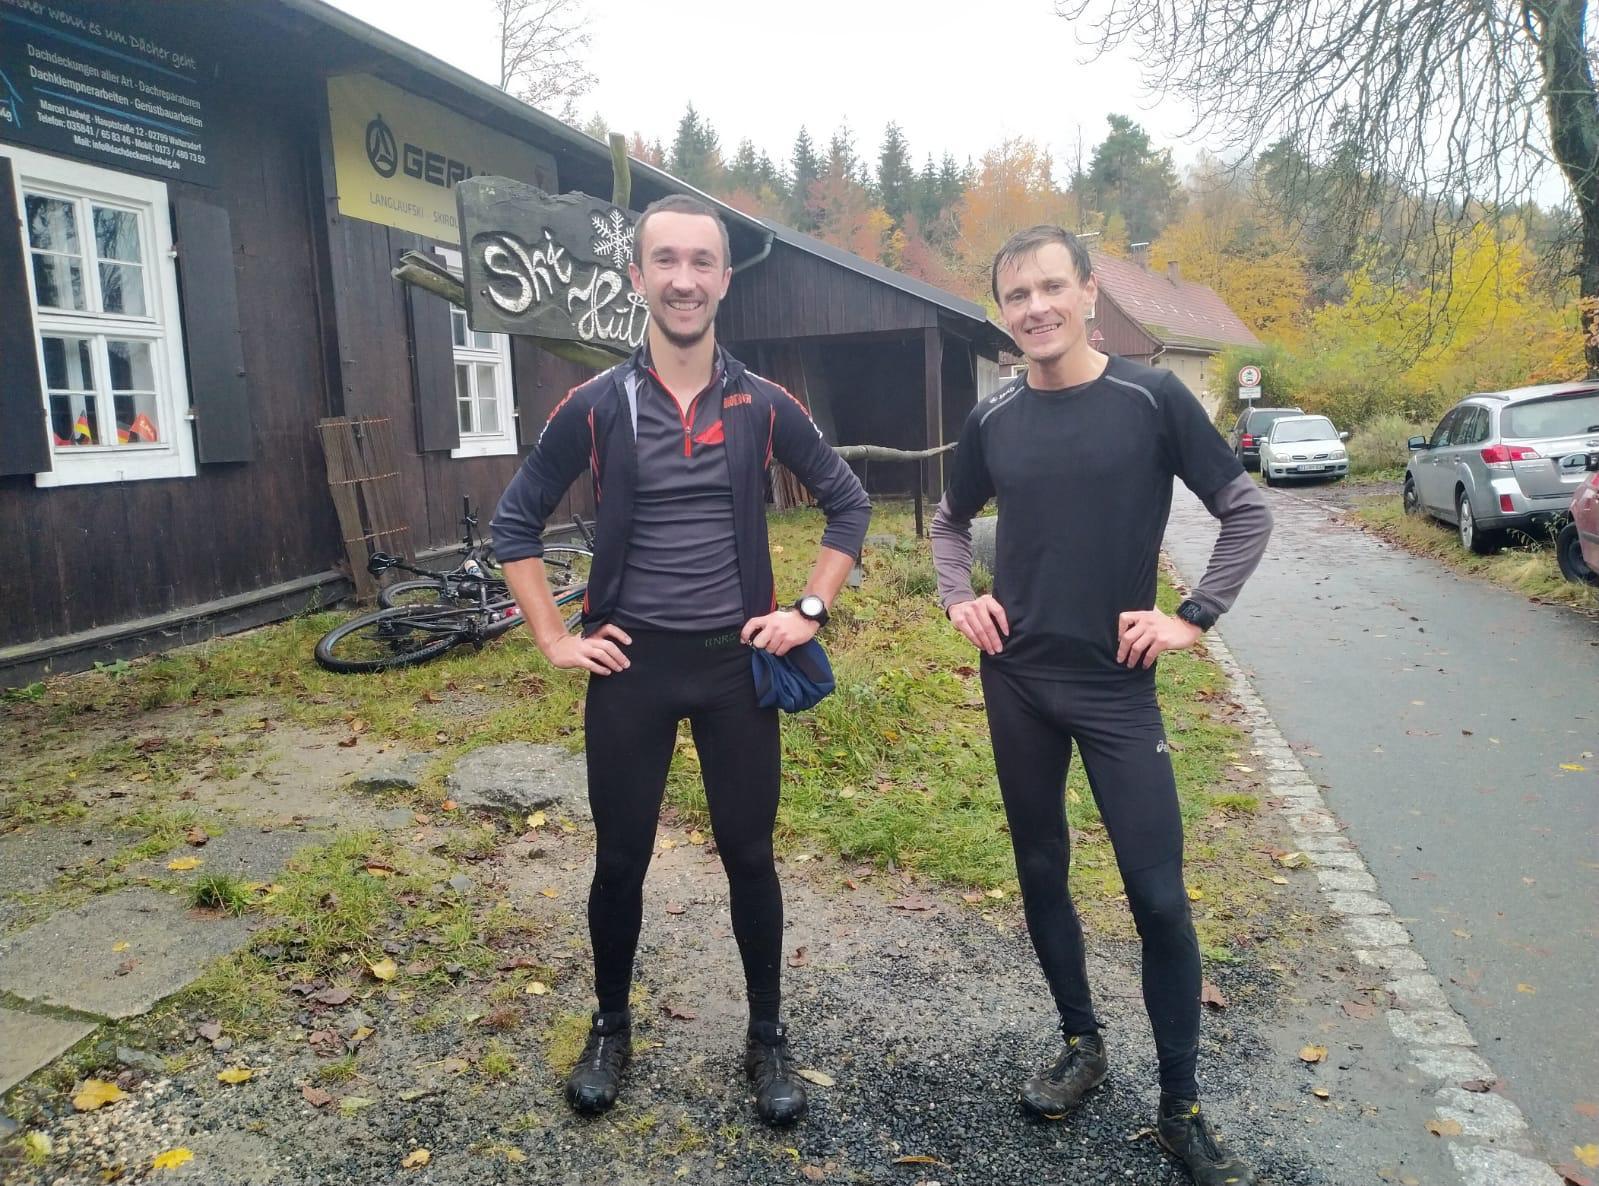 Alle Gipfel Tour Zielfoto - v.l.n.r: Stephan, Robert